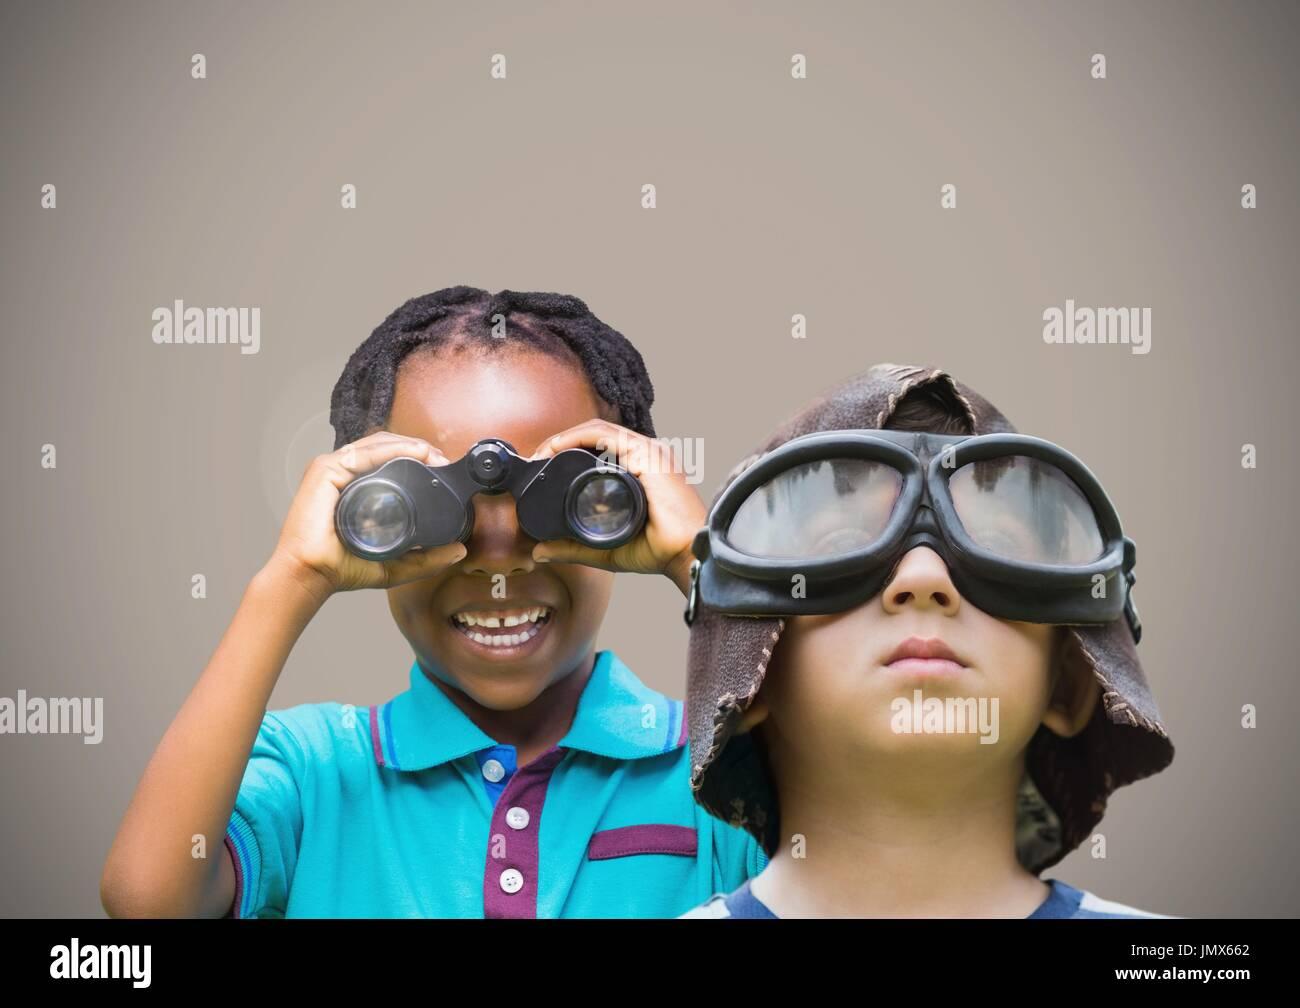 Digital composite kinder halten ferngläser mit leeren braunen